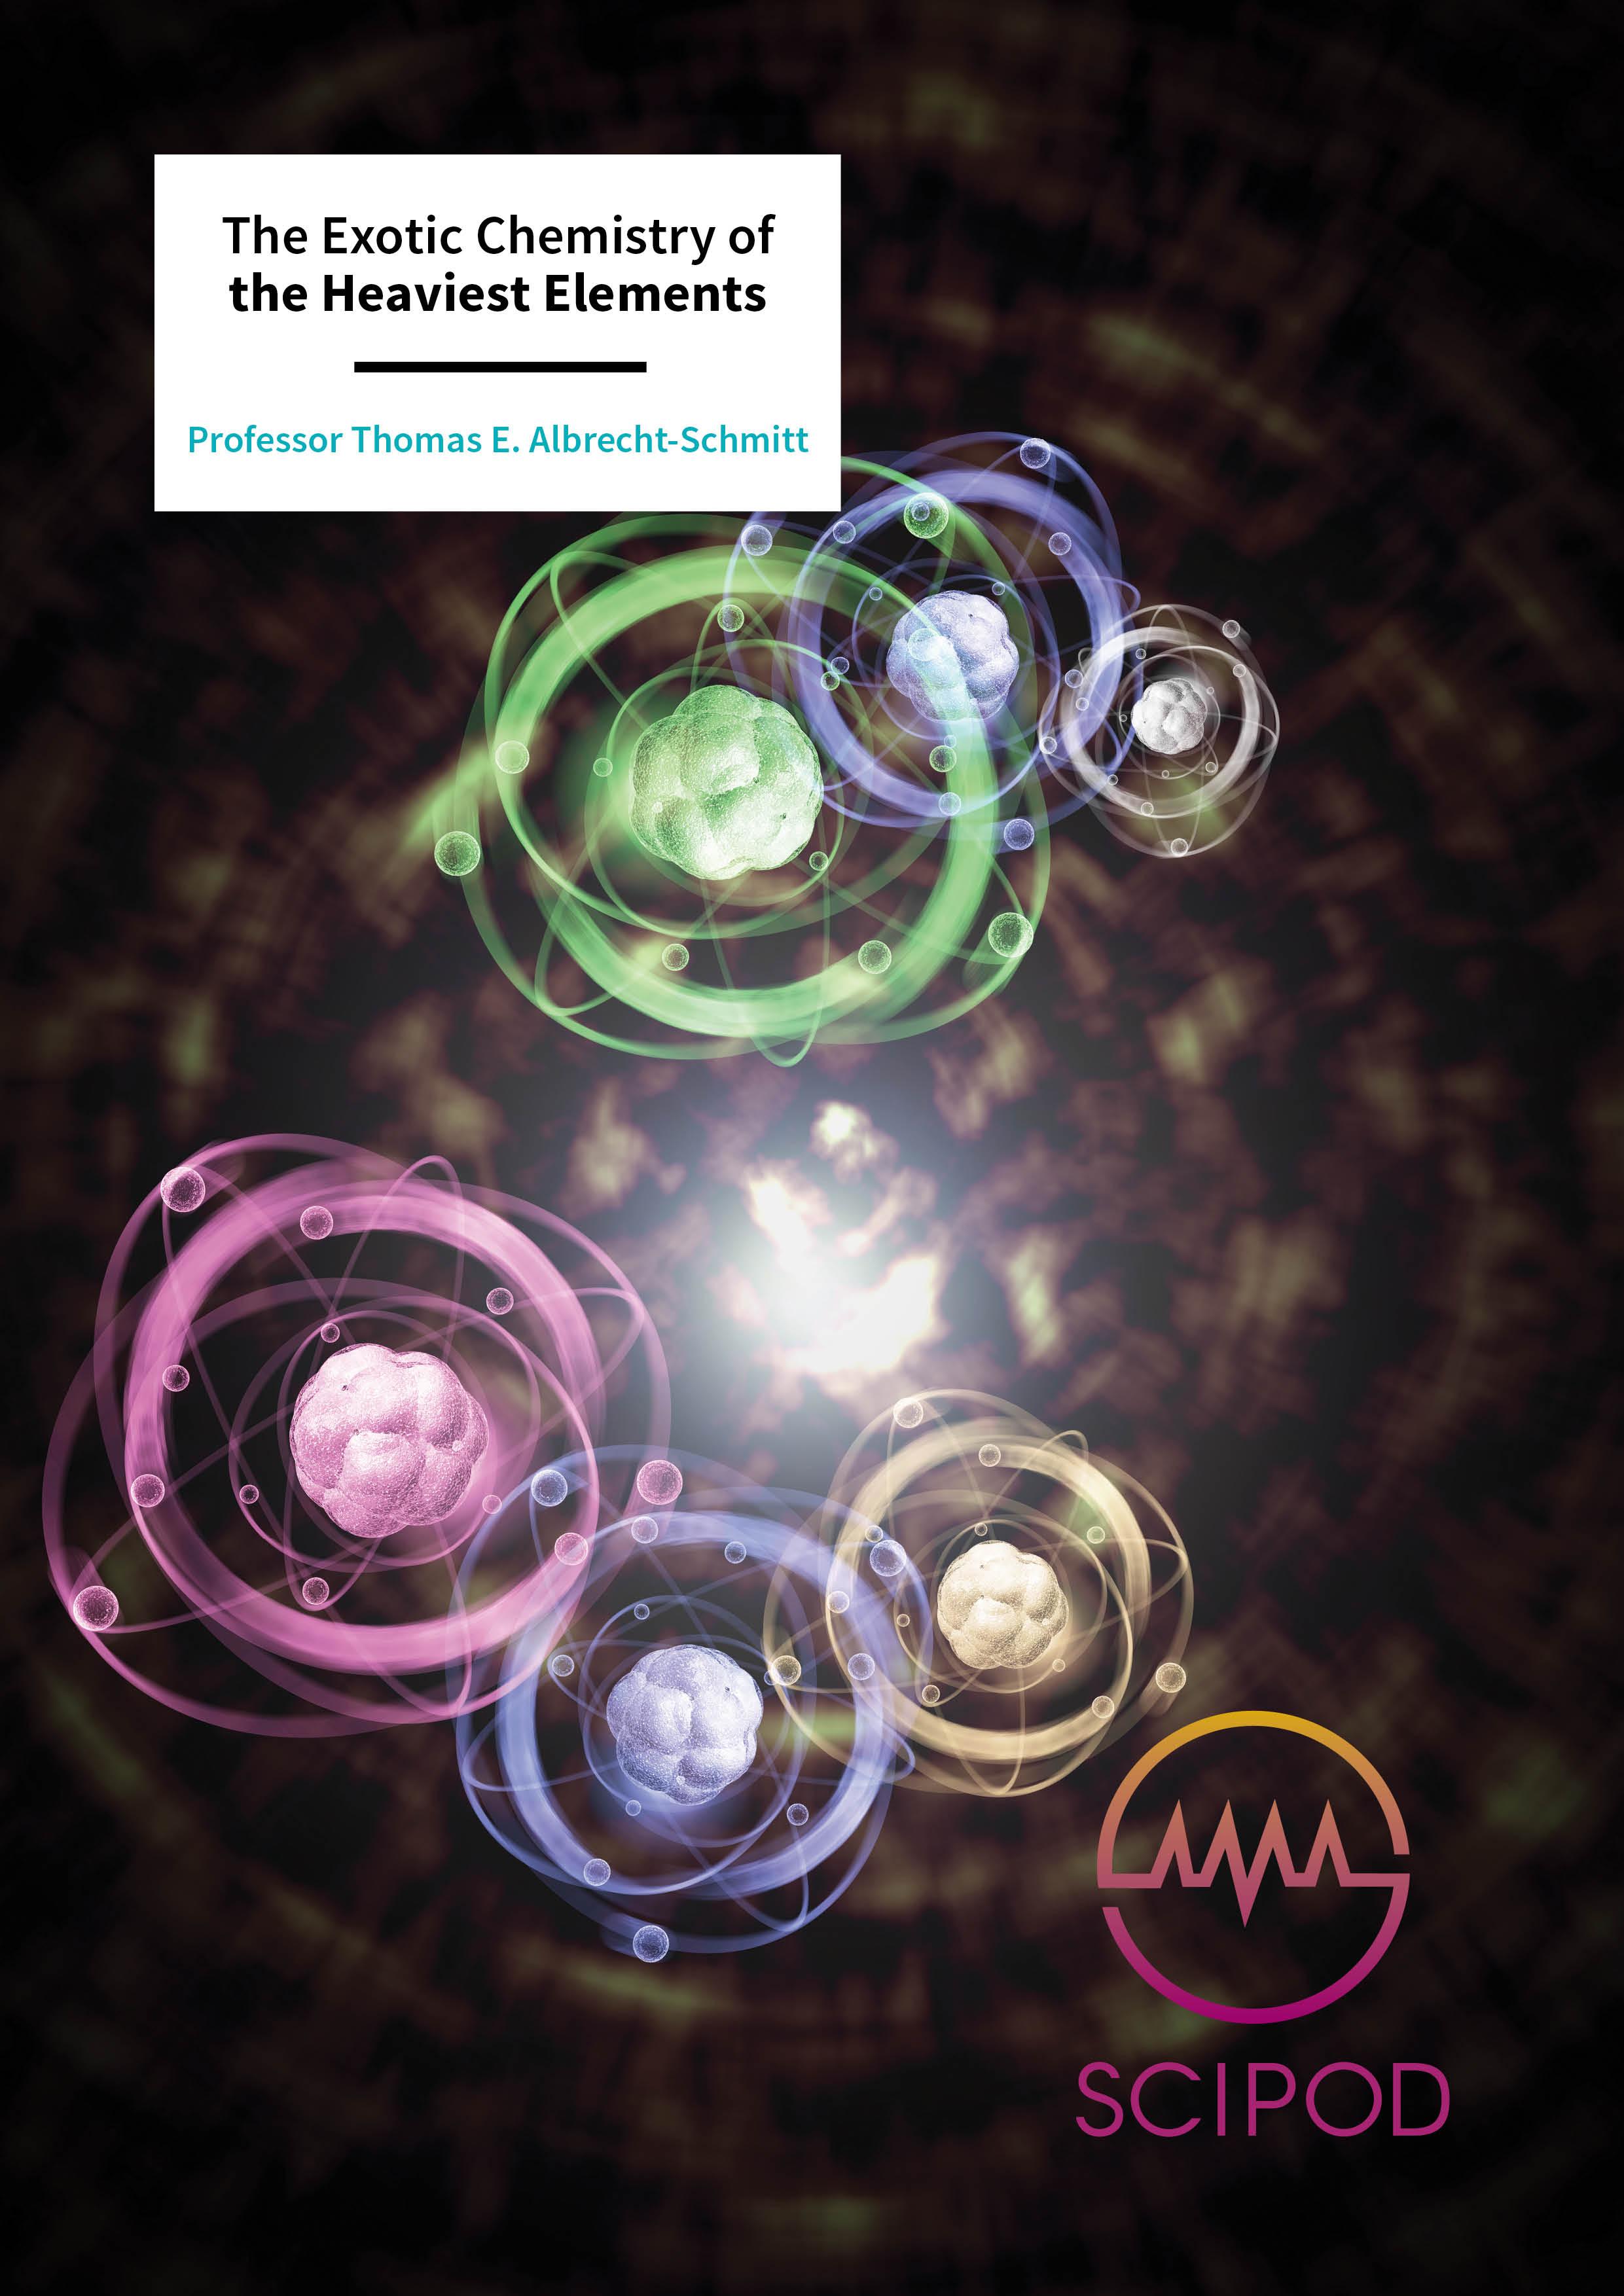 The Exotic Chemistry of the Heaviest Elements – Professor Thomas E. Albrecht-Schmitt, Florida State University